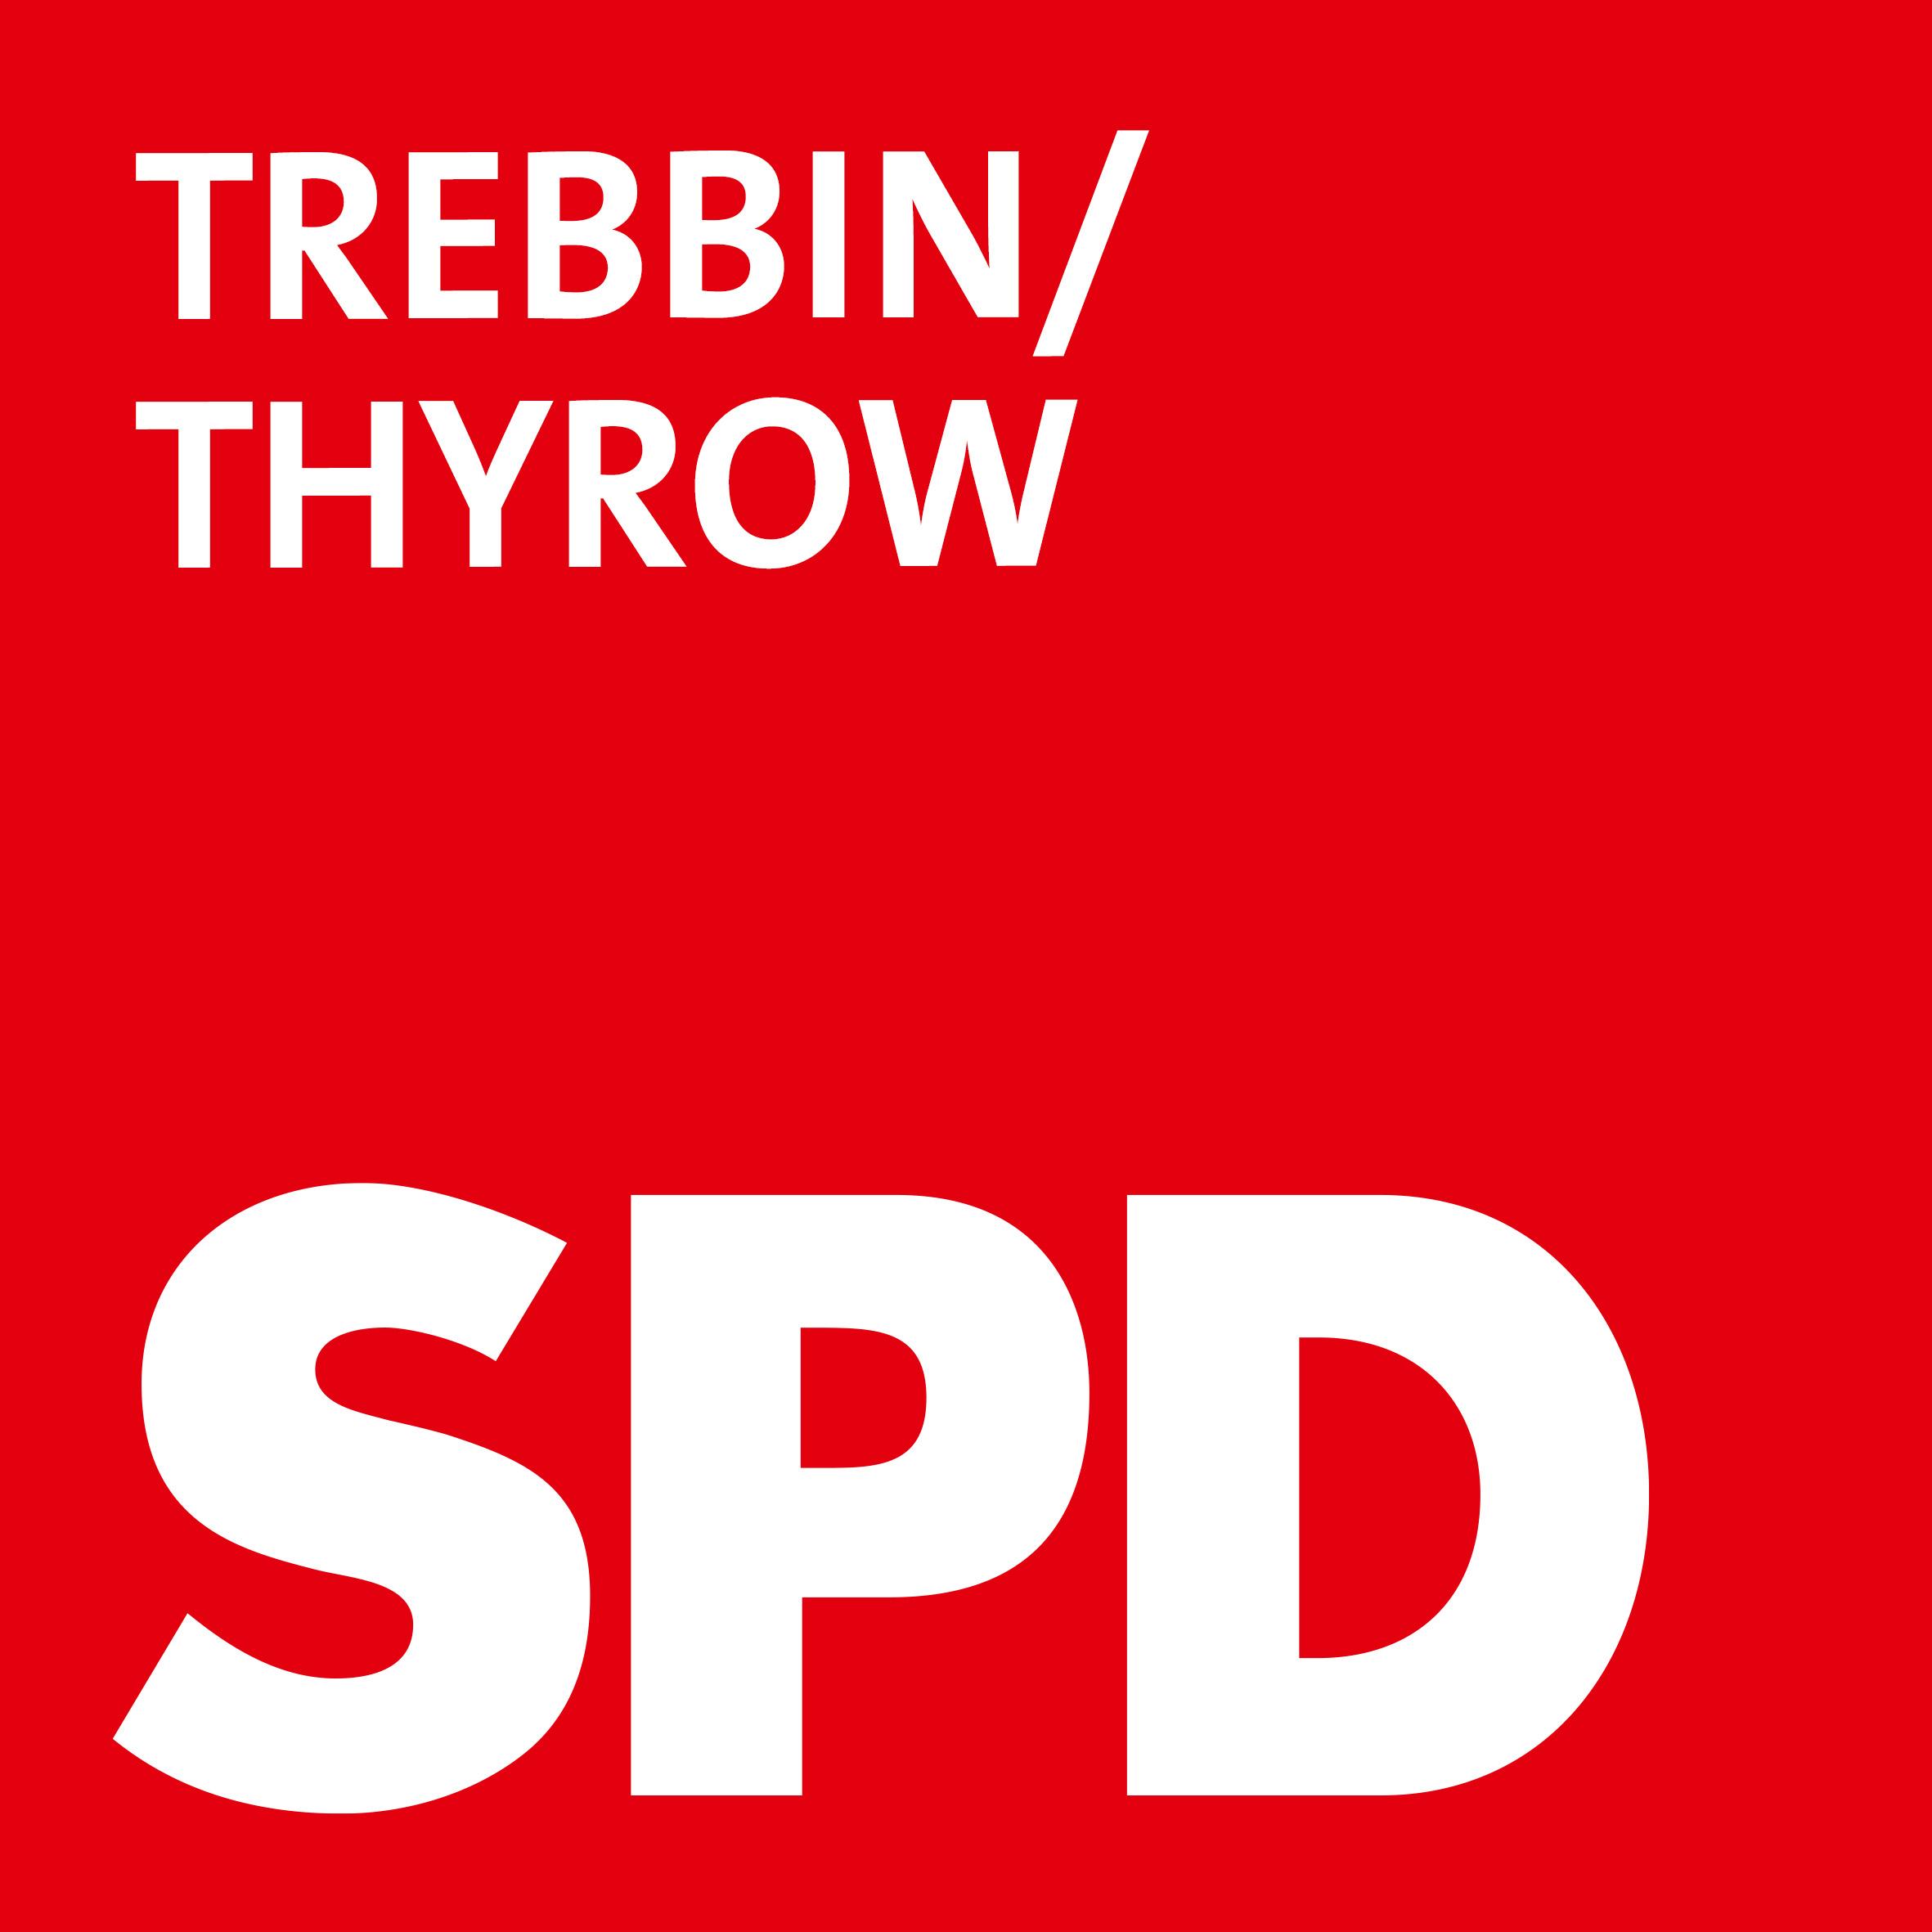 SPD Trebbin/Thyrow